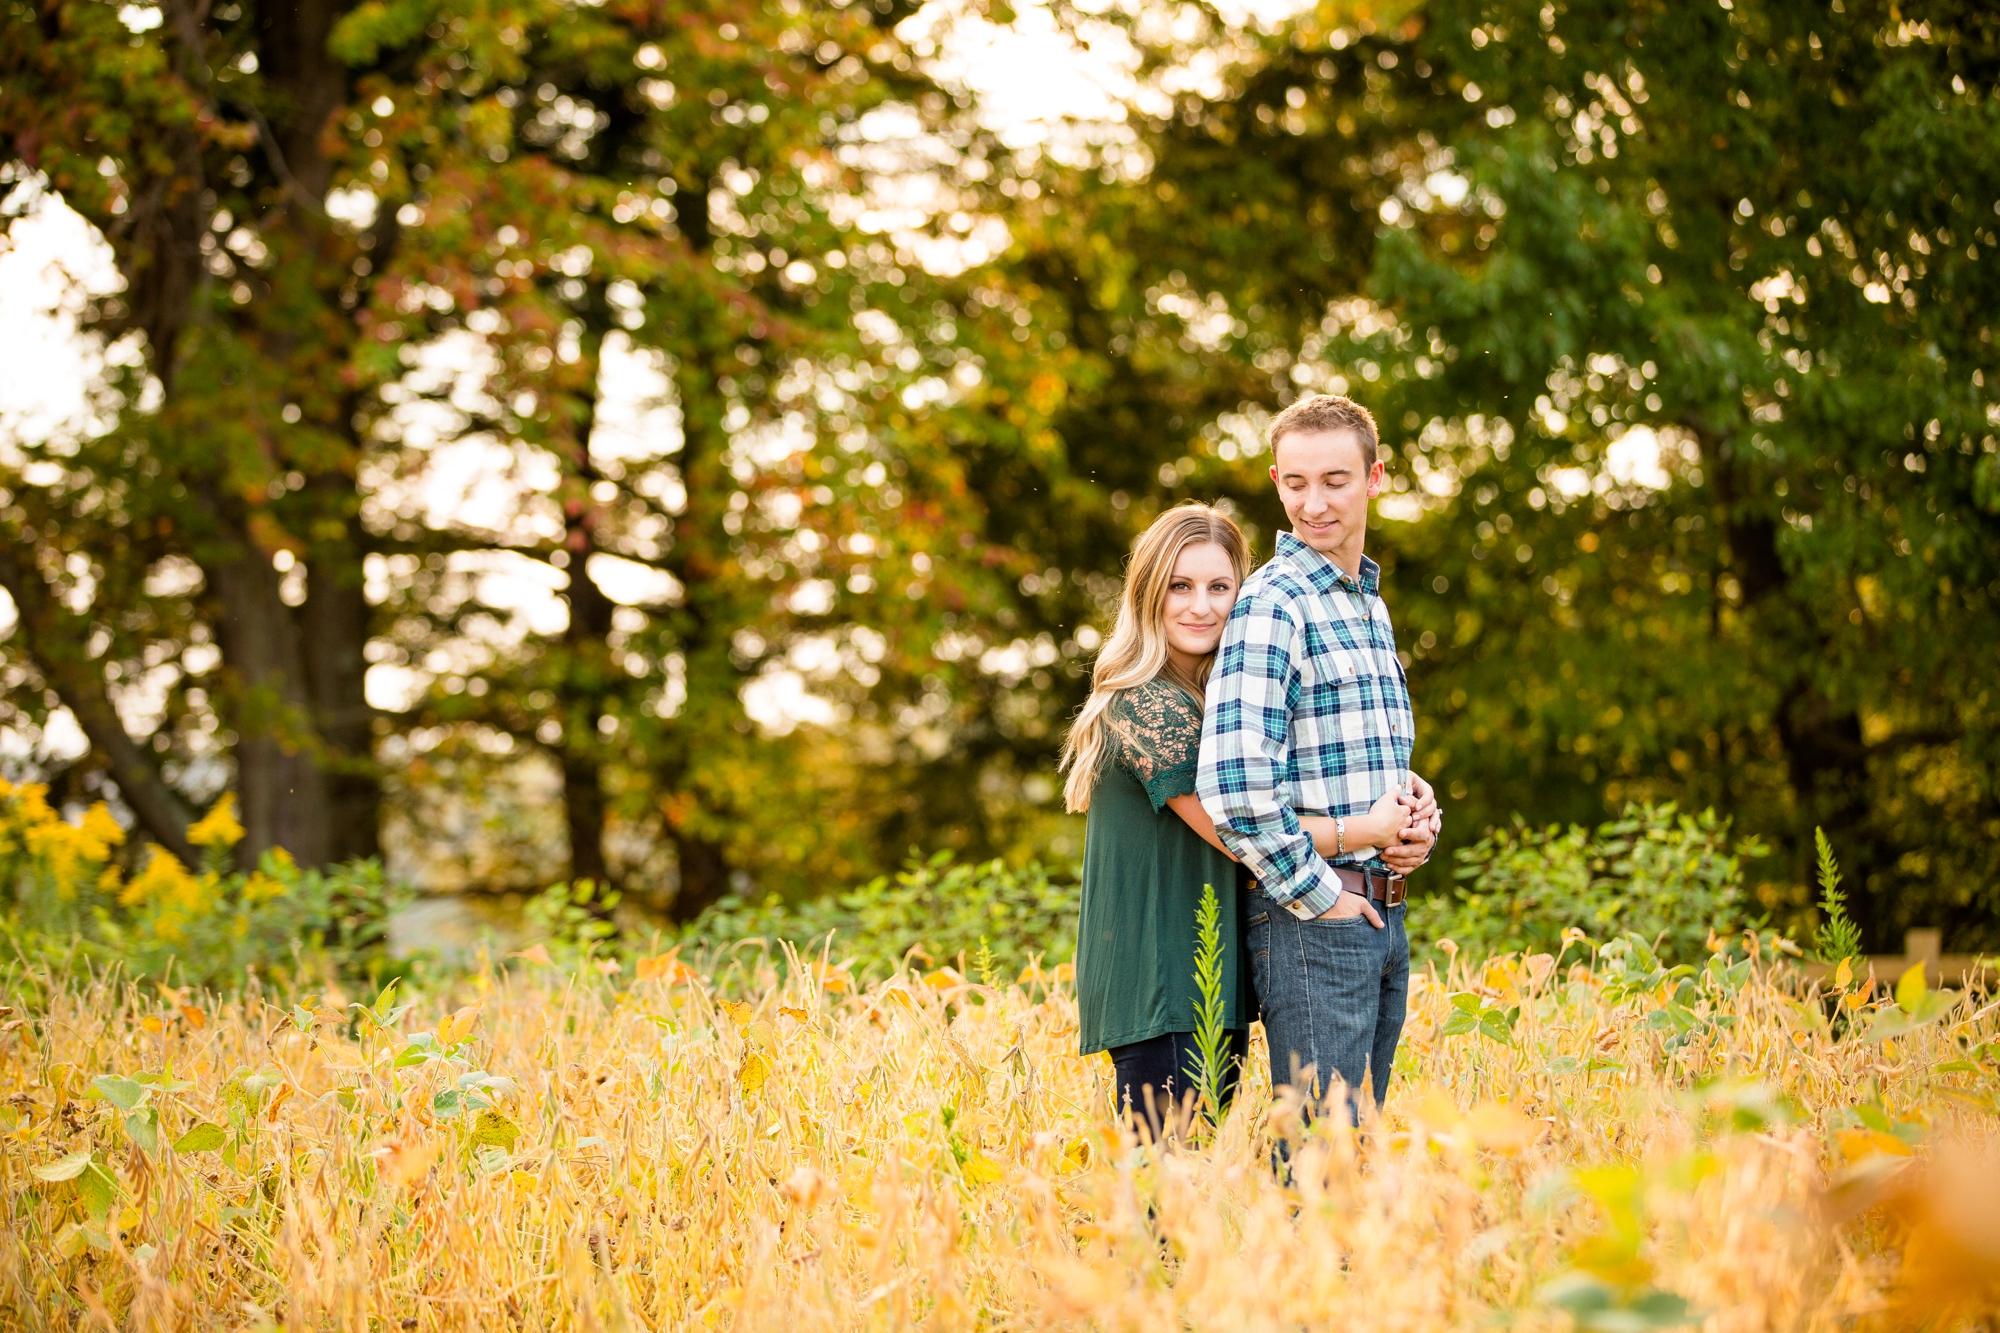 mcconnells mill engagement photos, mcconnells mill senior photos, mcconnells mill wedding photos, mcconnells mill anniversary photos, mcconnells mill photographer